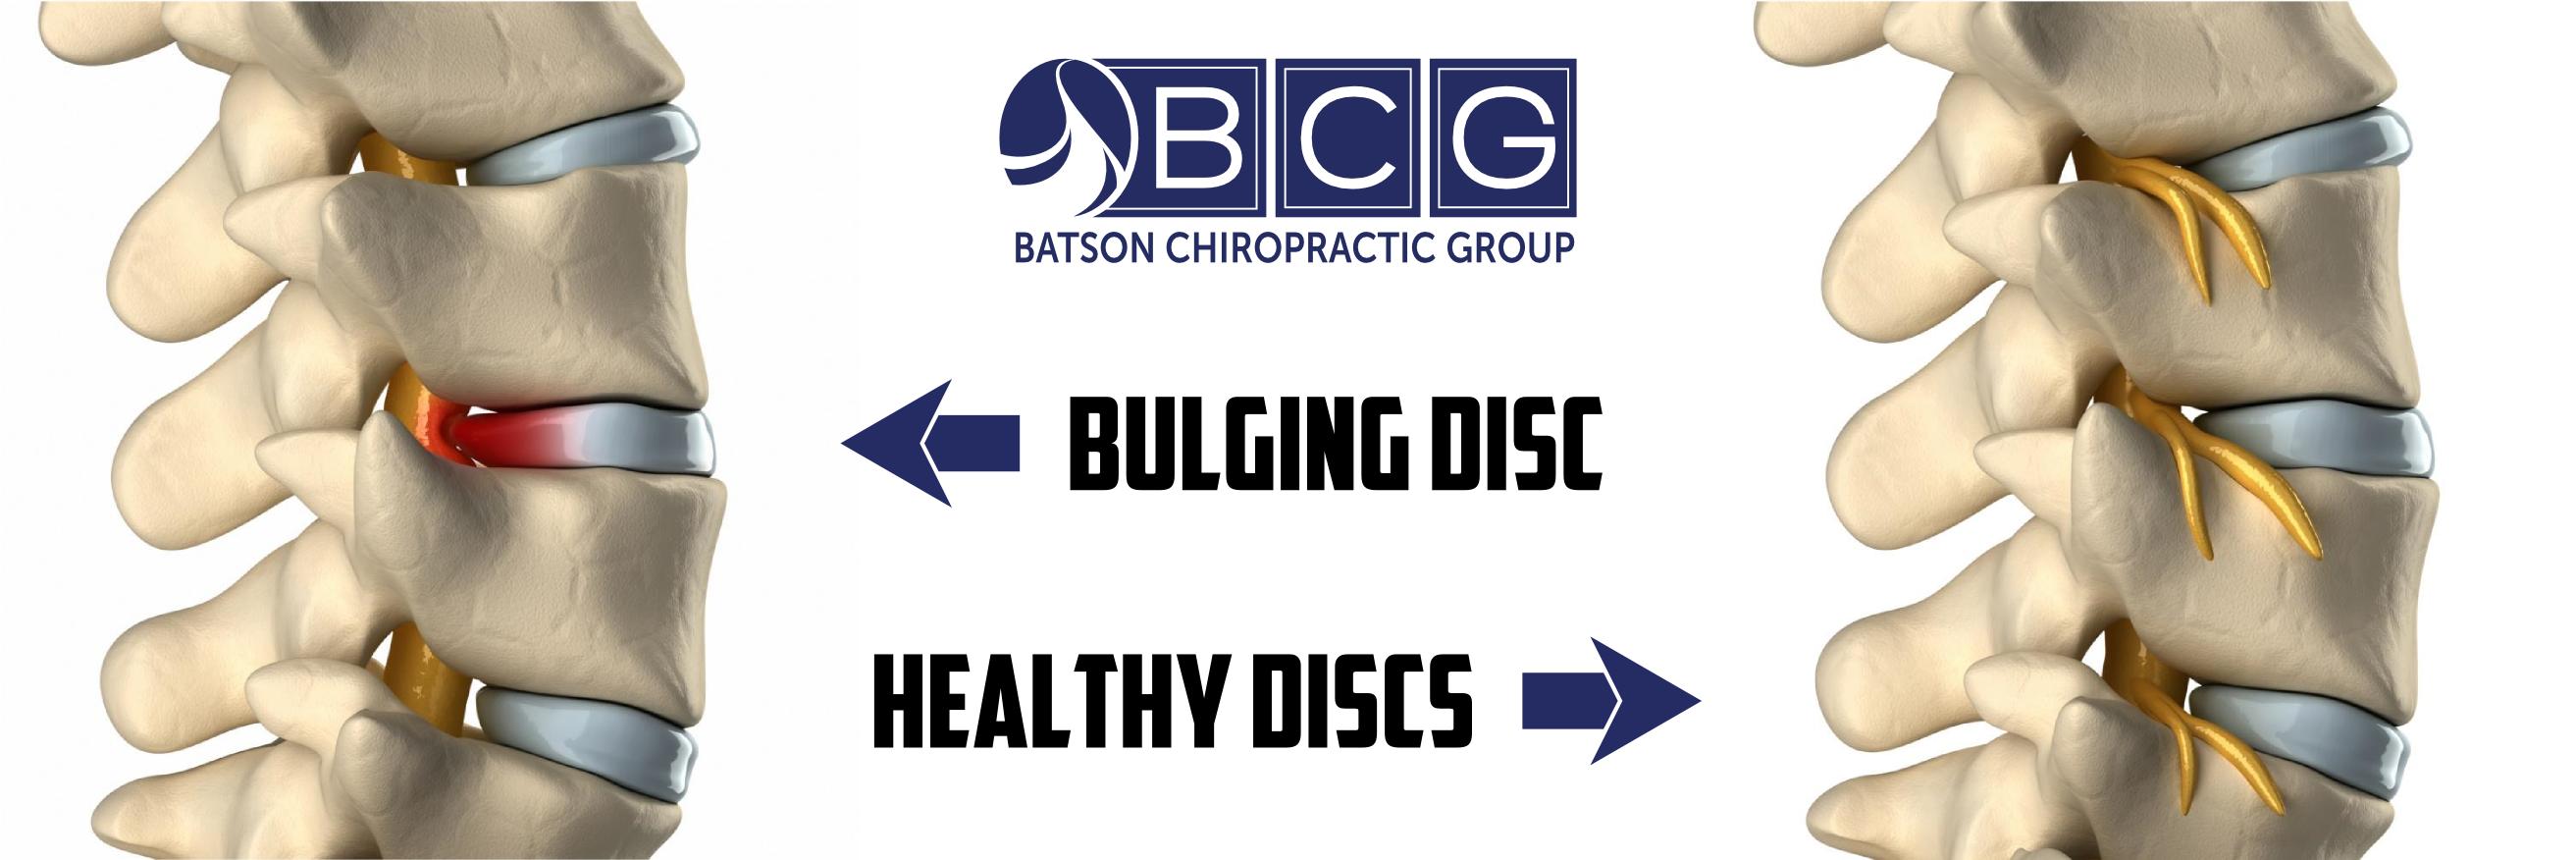 Bulging Herniated Disc